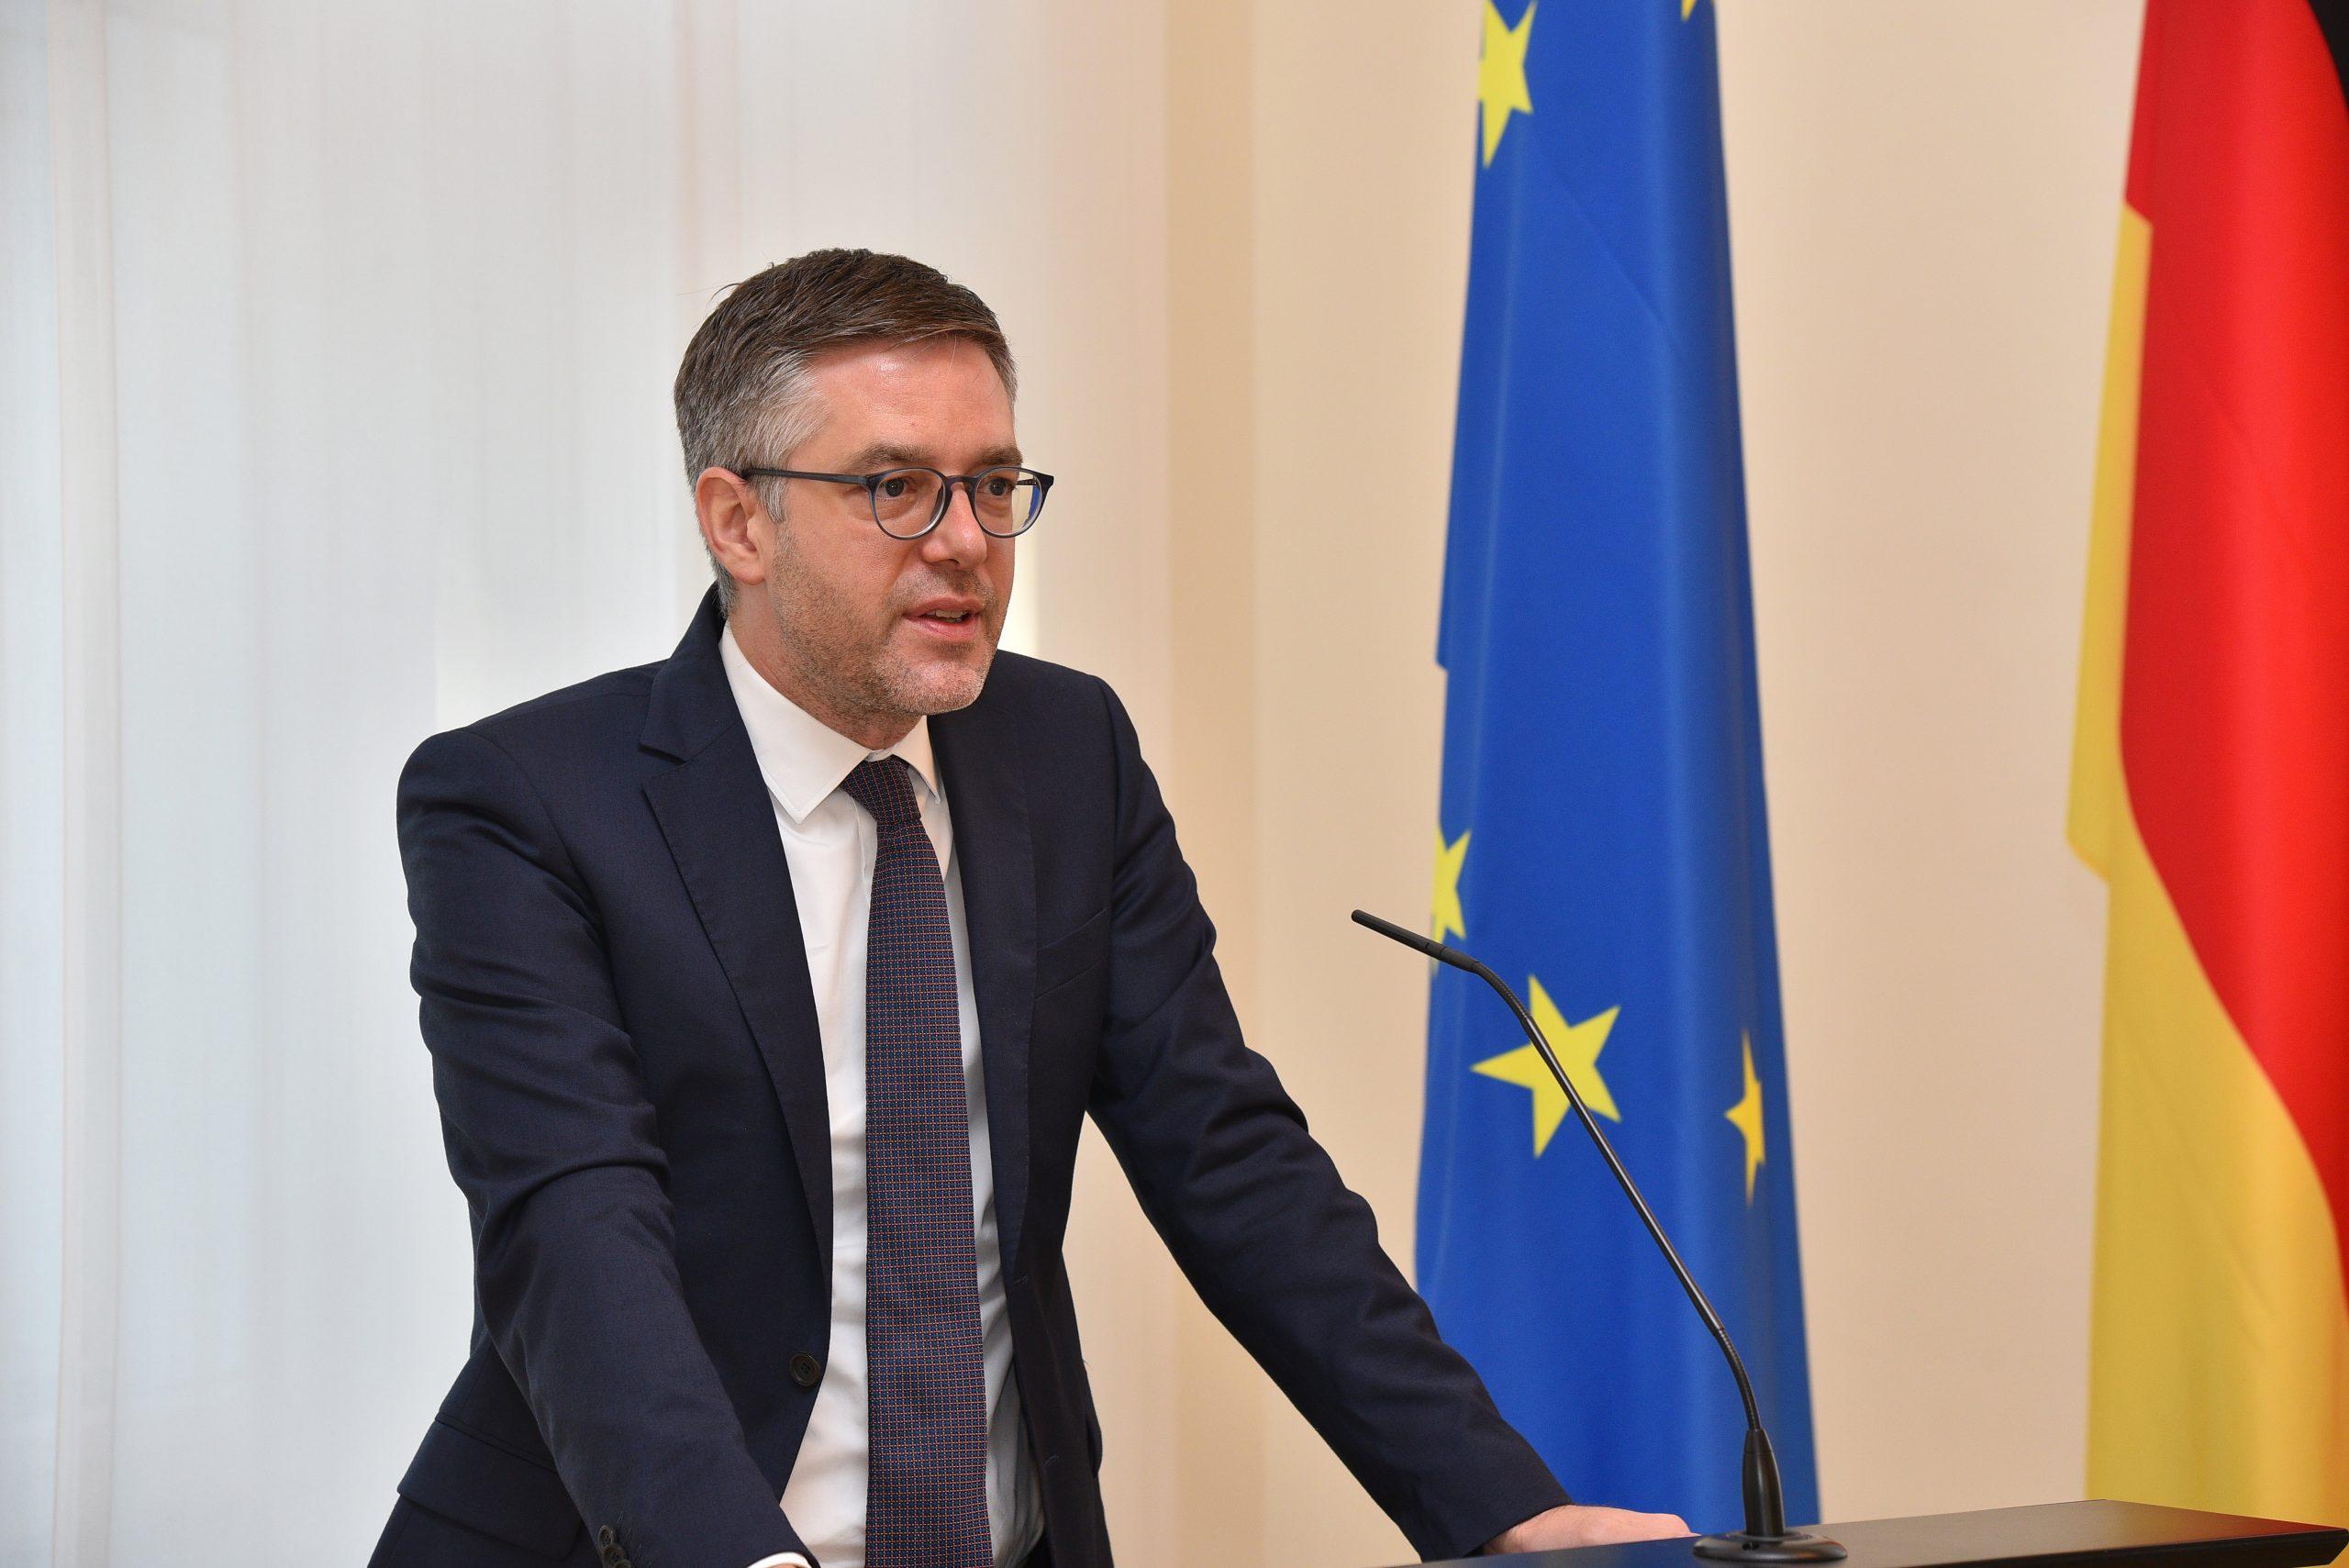 Chef der Staatskanzlei Fabian Kirsch